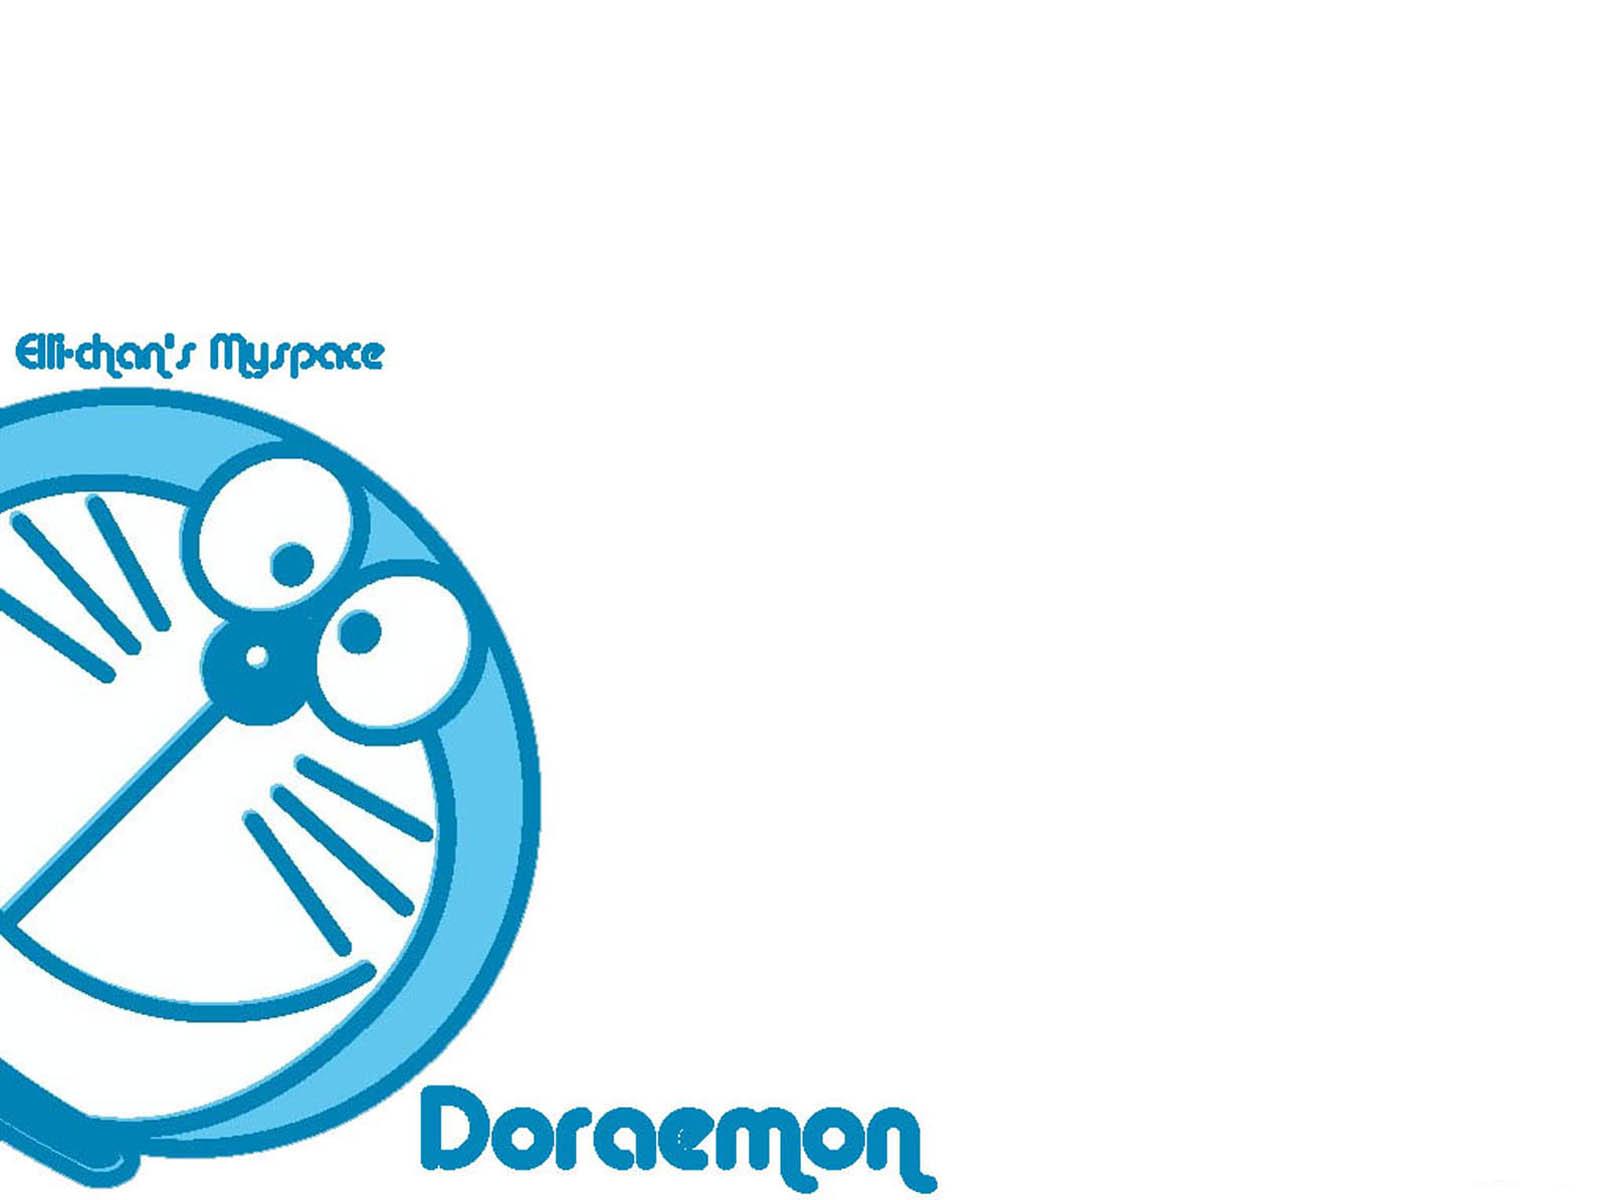 75 Doraemon Wallpapers On Wallpapersafari